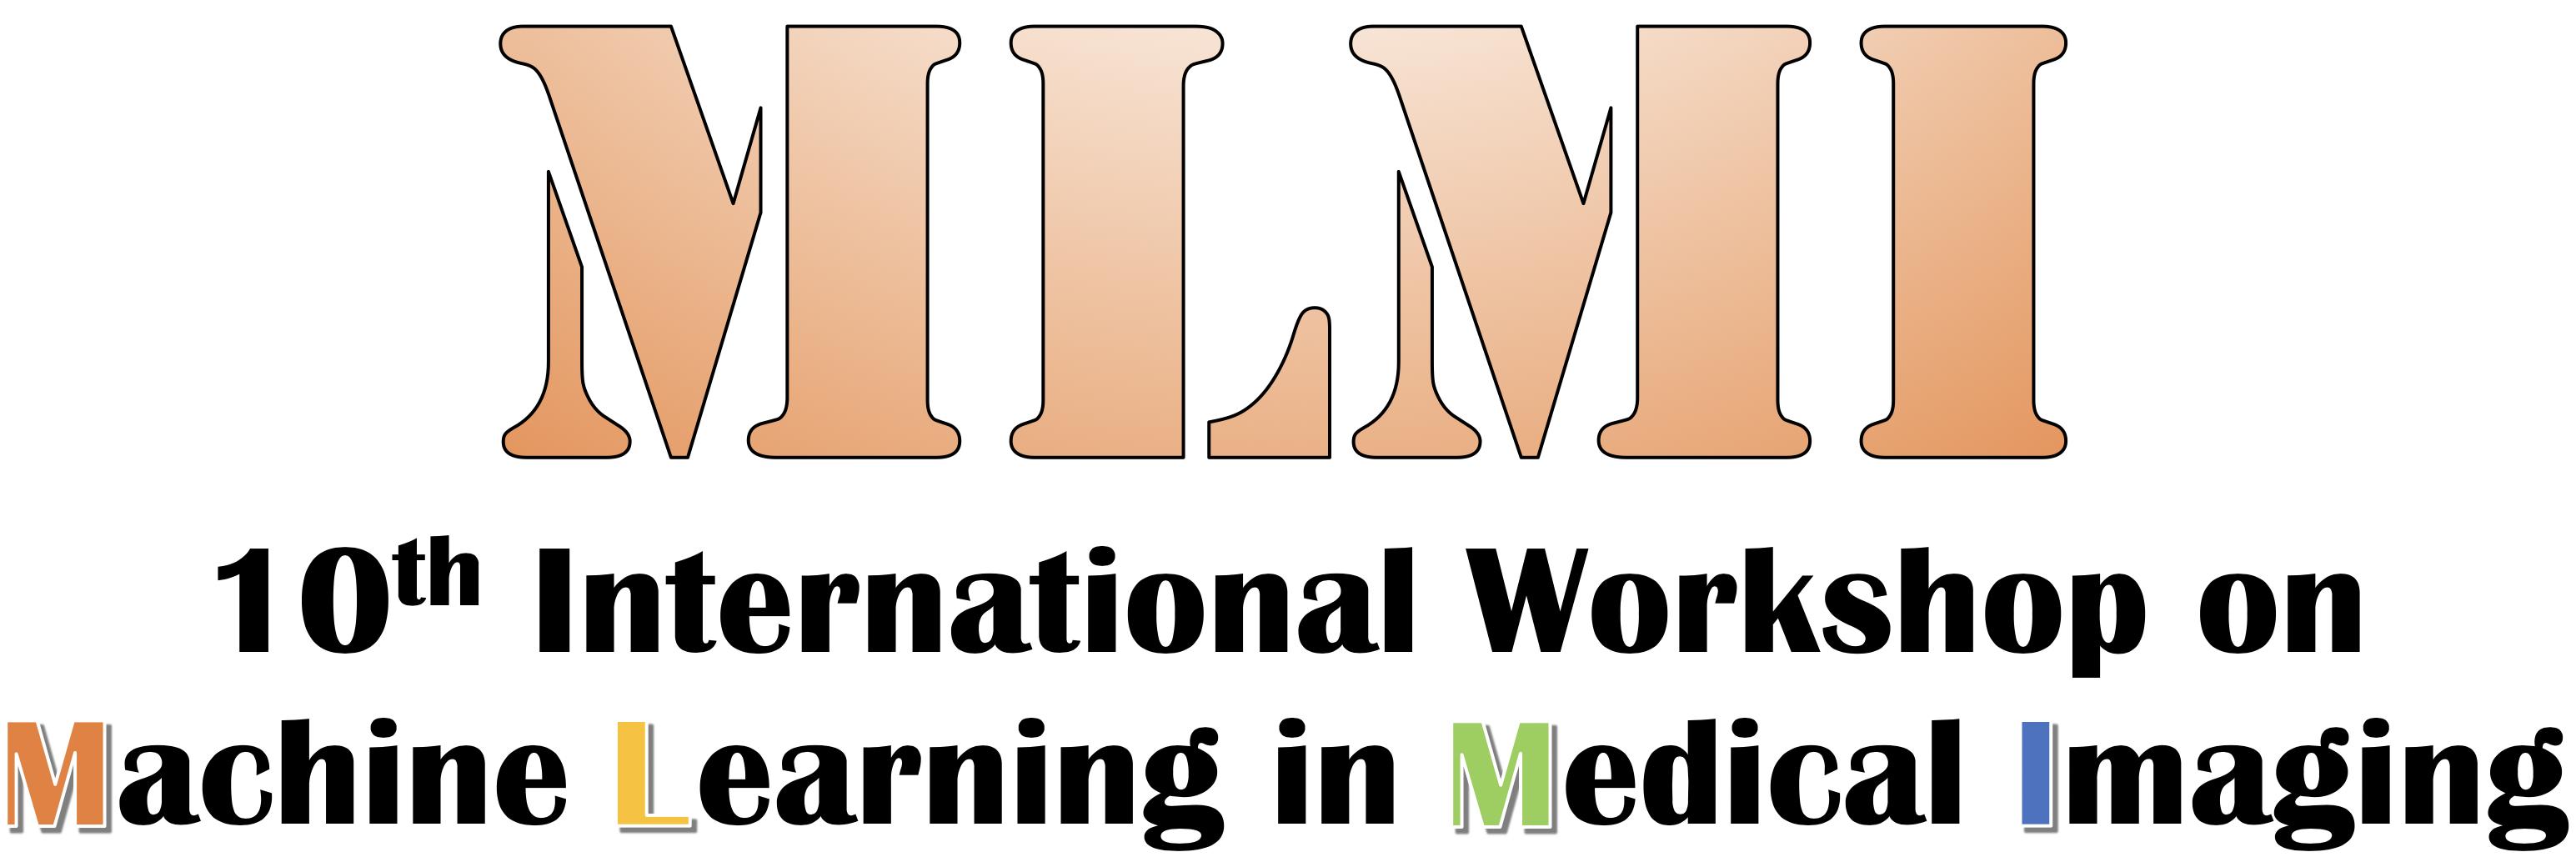 10th International Workshop on Machine Learning in Medical Imaging (MLMI 2019)